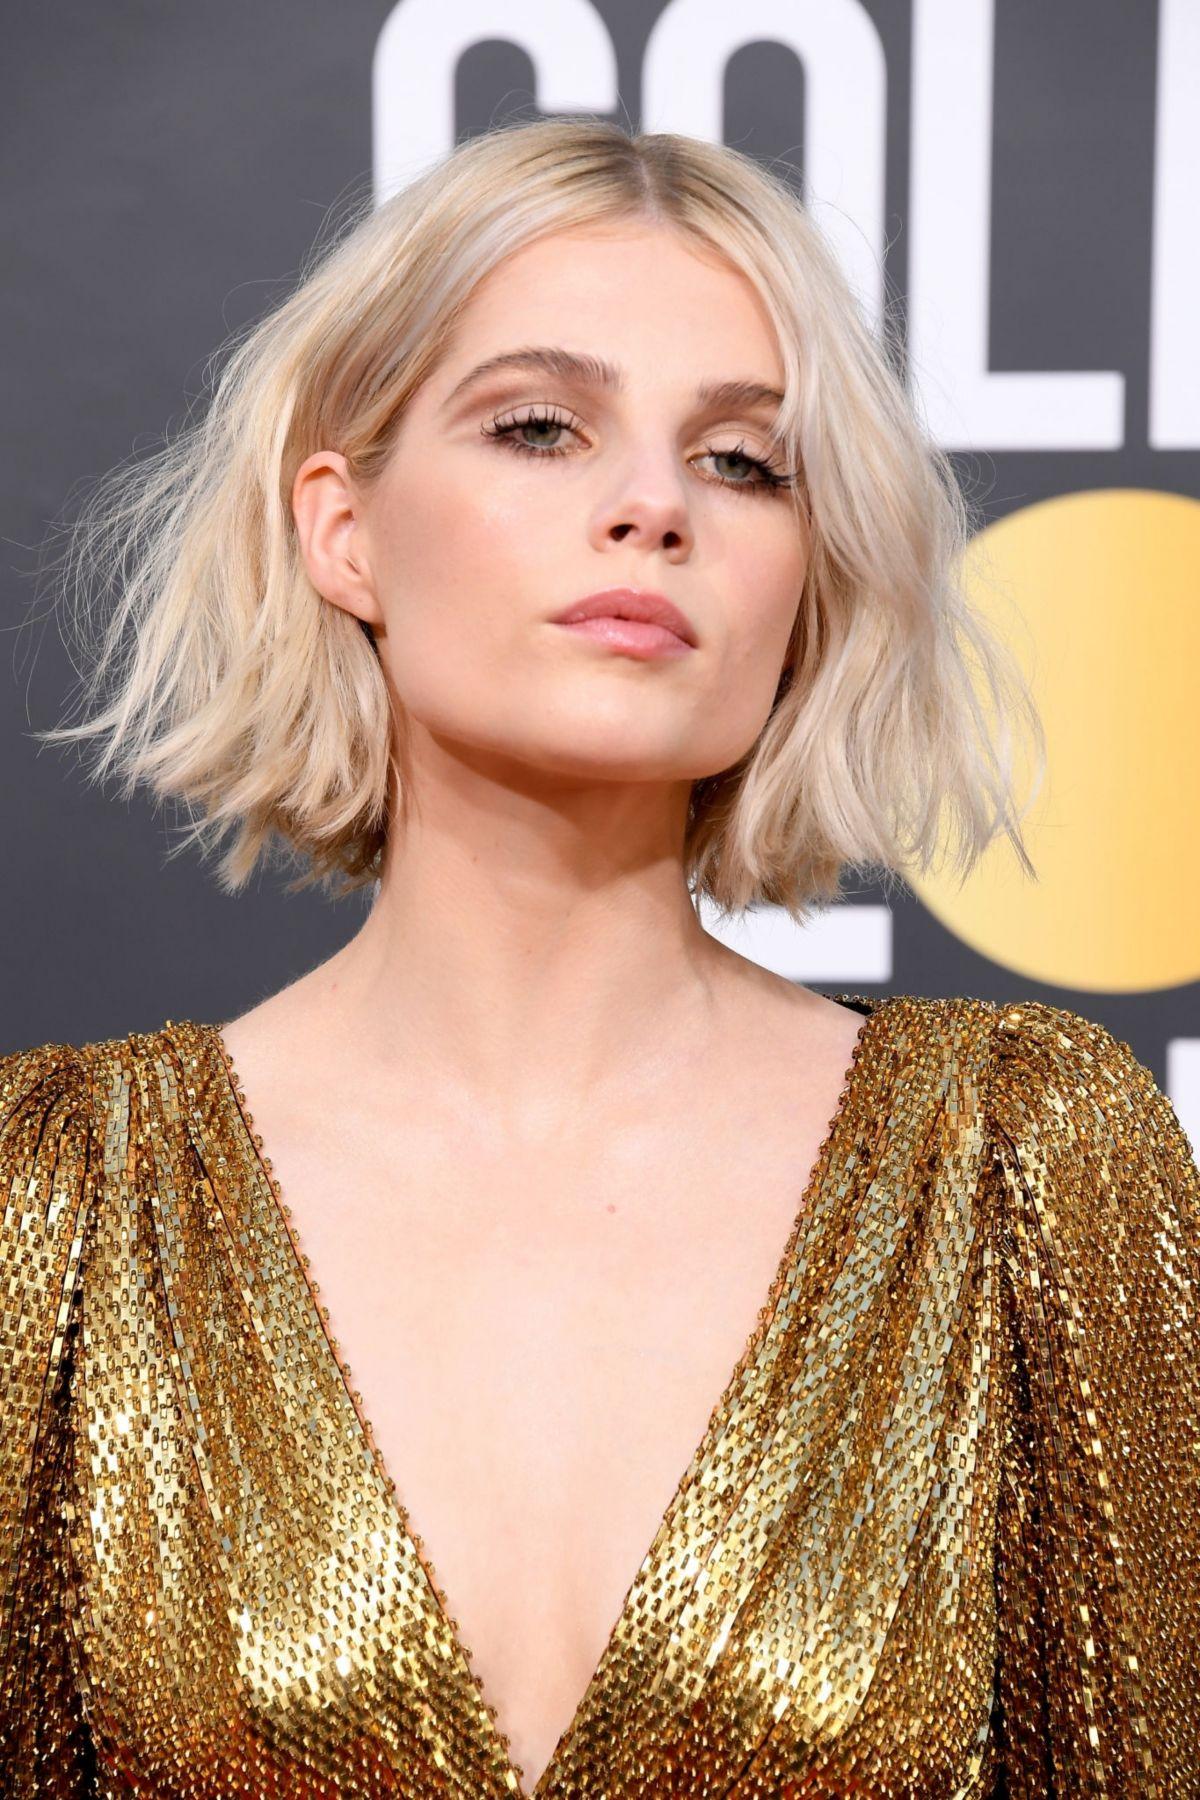 lucy-boynton-at-2019-golden-globe-awards-in-beverly-hills-01-06-2019-7.jpg